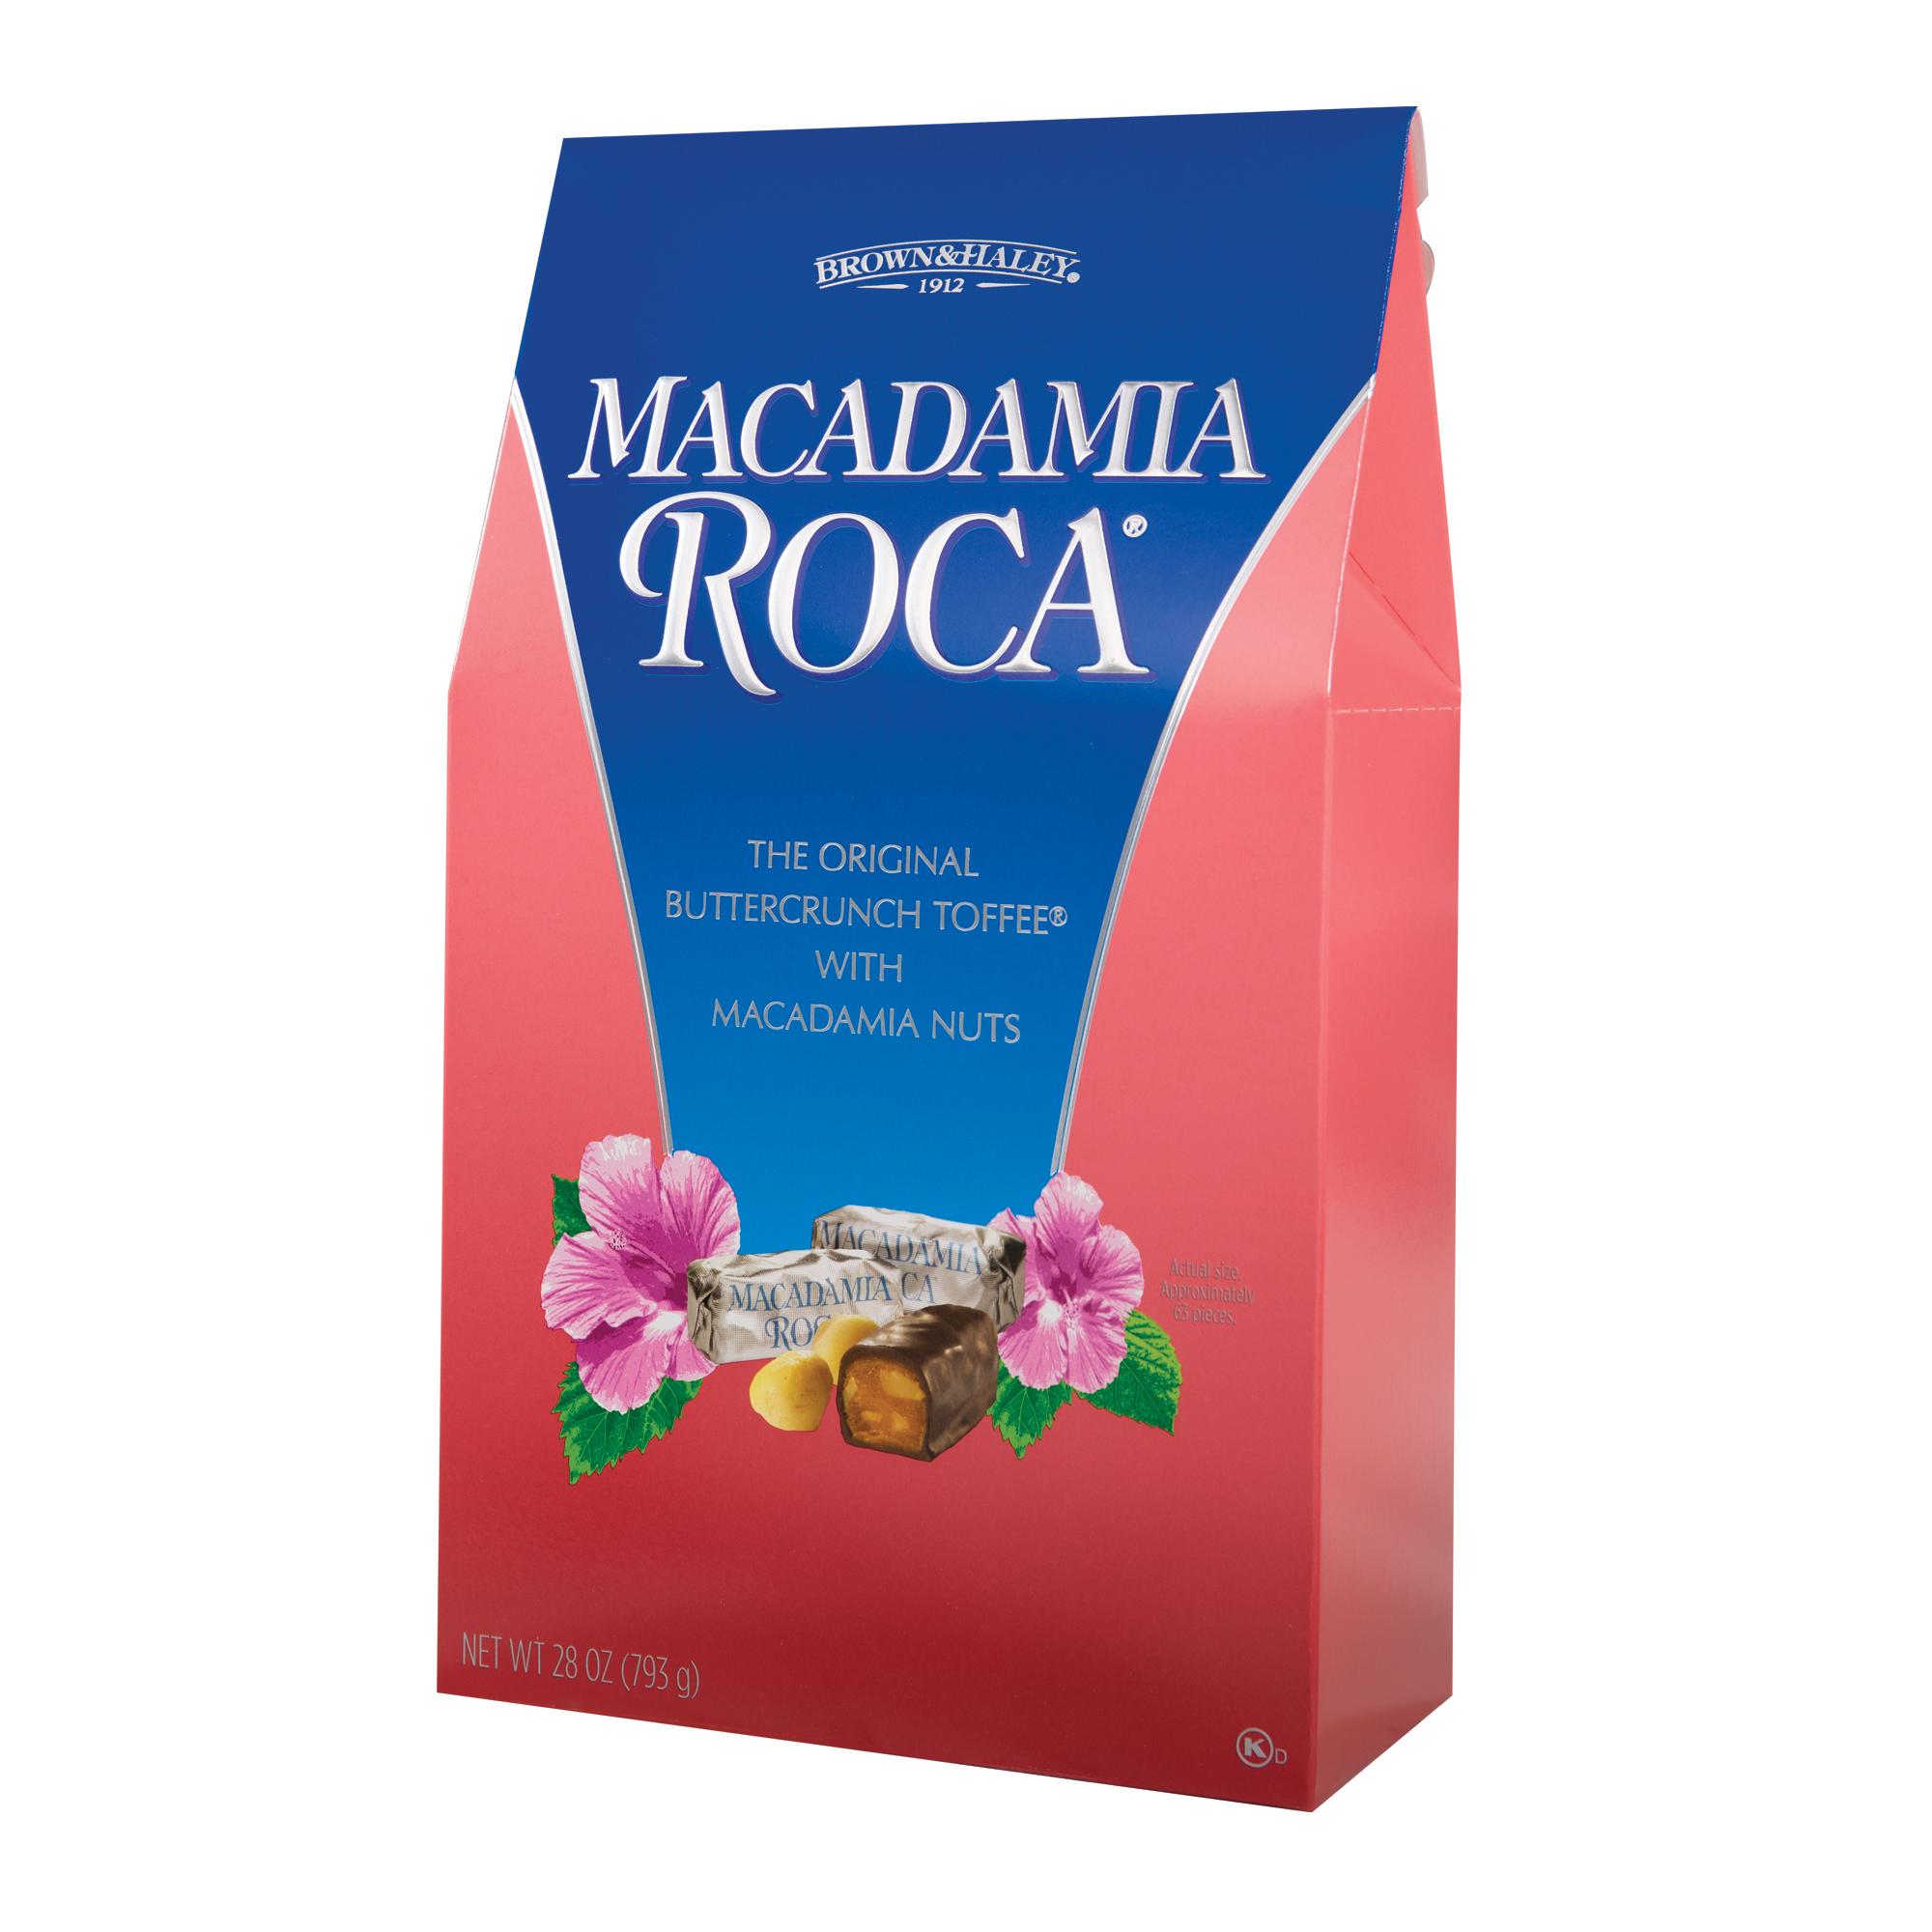 0356 28 oz MACADAMIA ROCA® Stand-up Box - Left-facing View